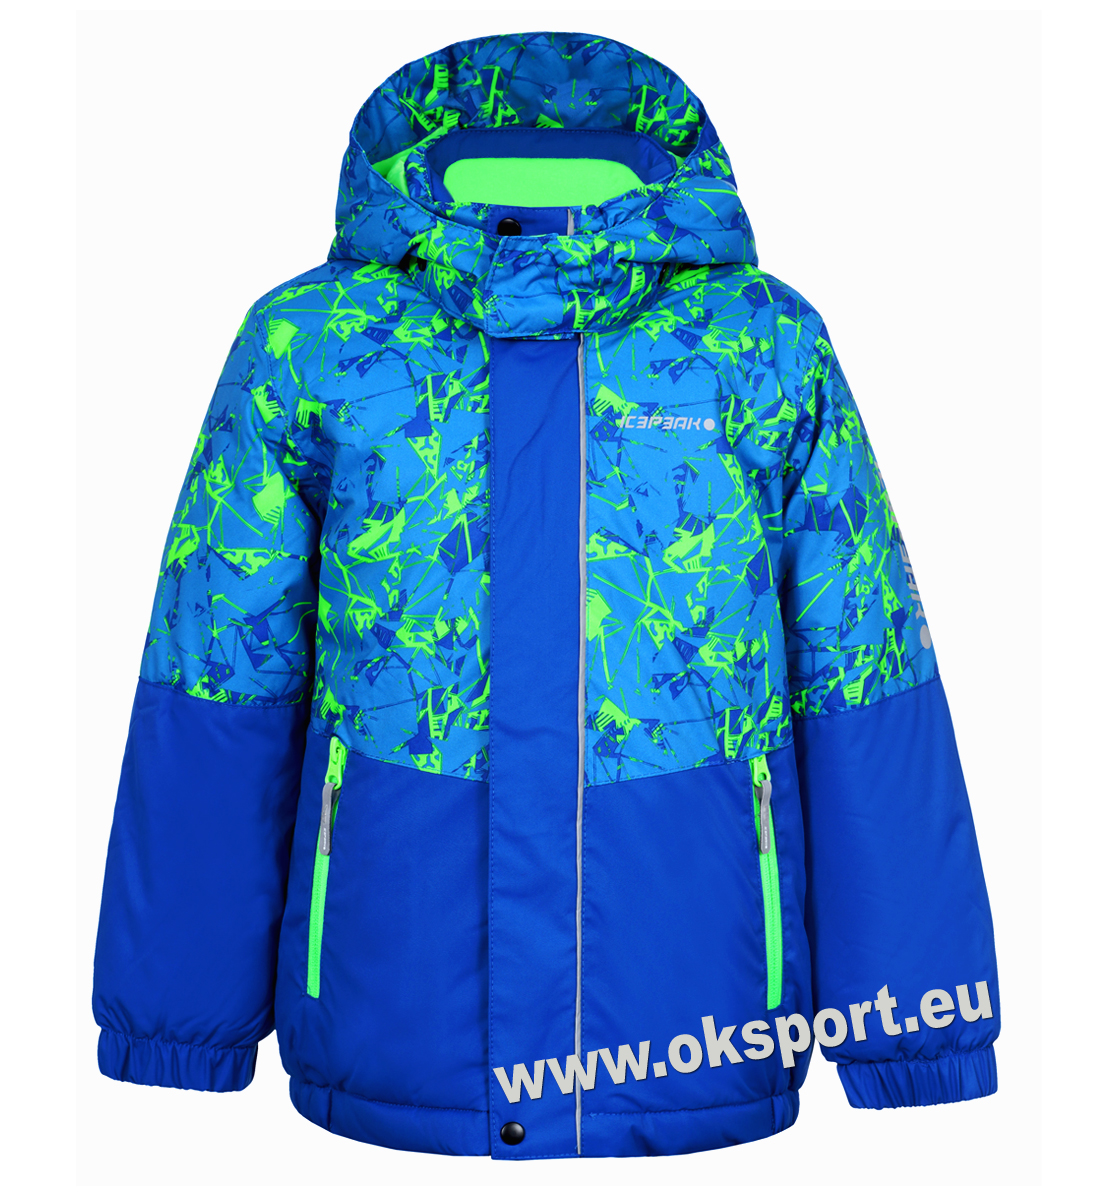 a4f7fbd2baf0 Chlapčenská zimná bunda Icepeak Jasper KD modrá zelená 50107-330